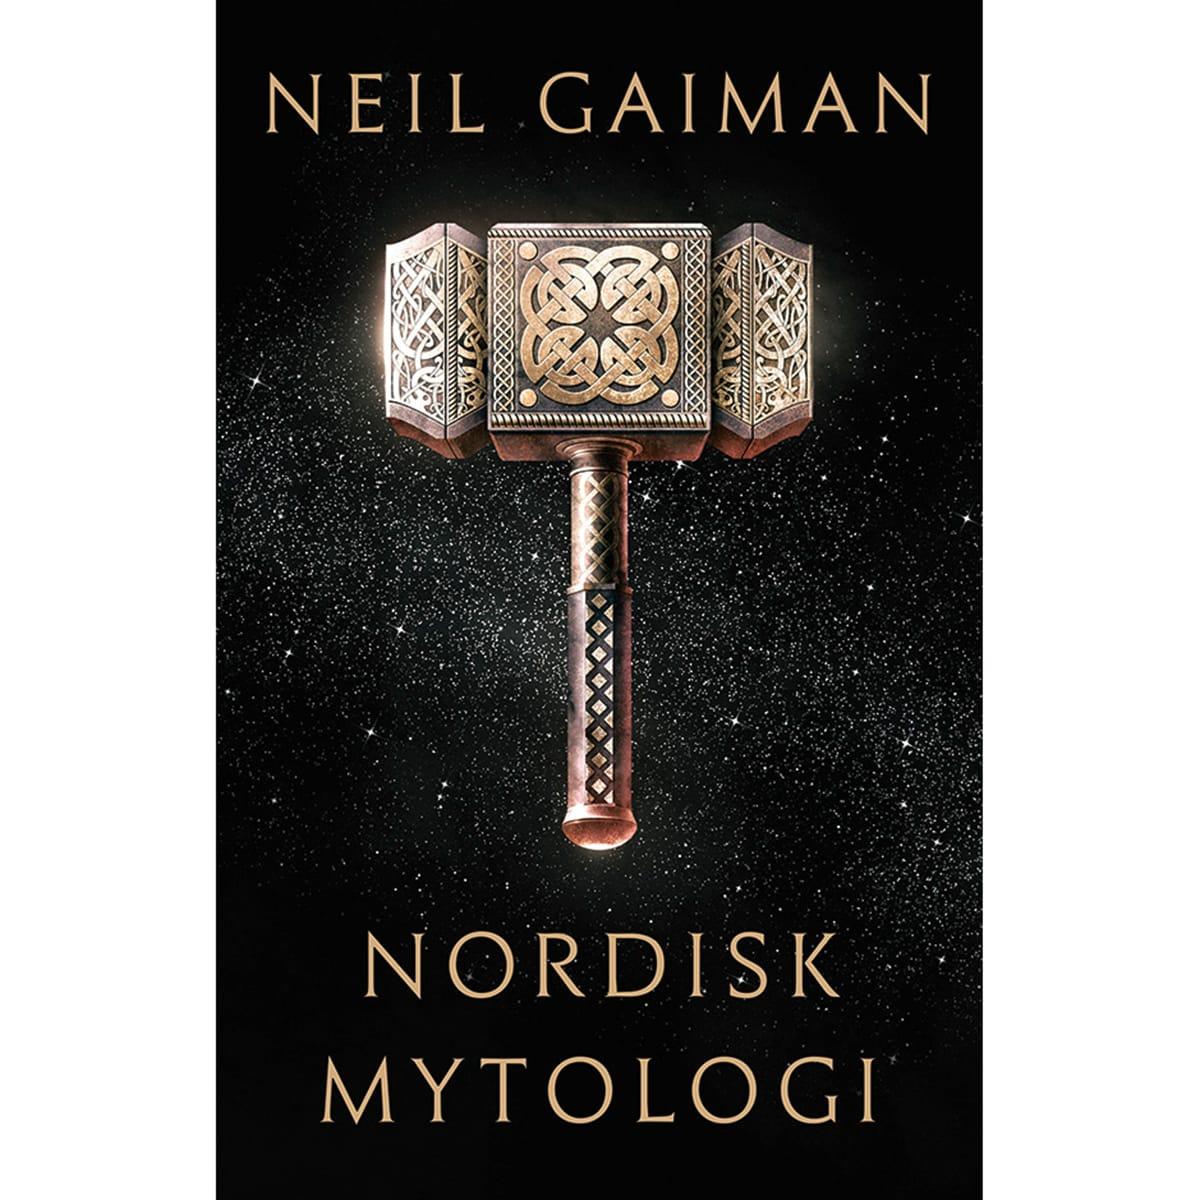 Af Neil Gaiman